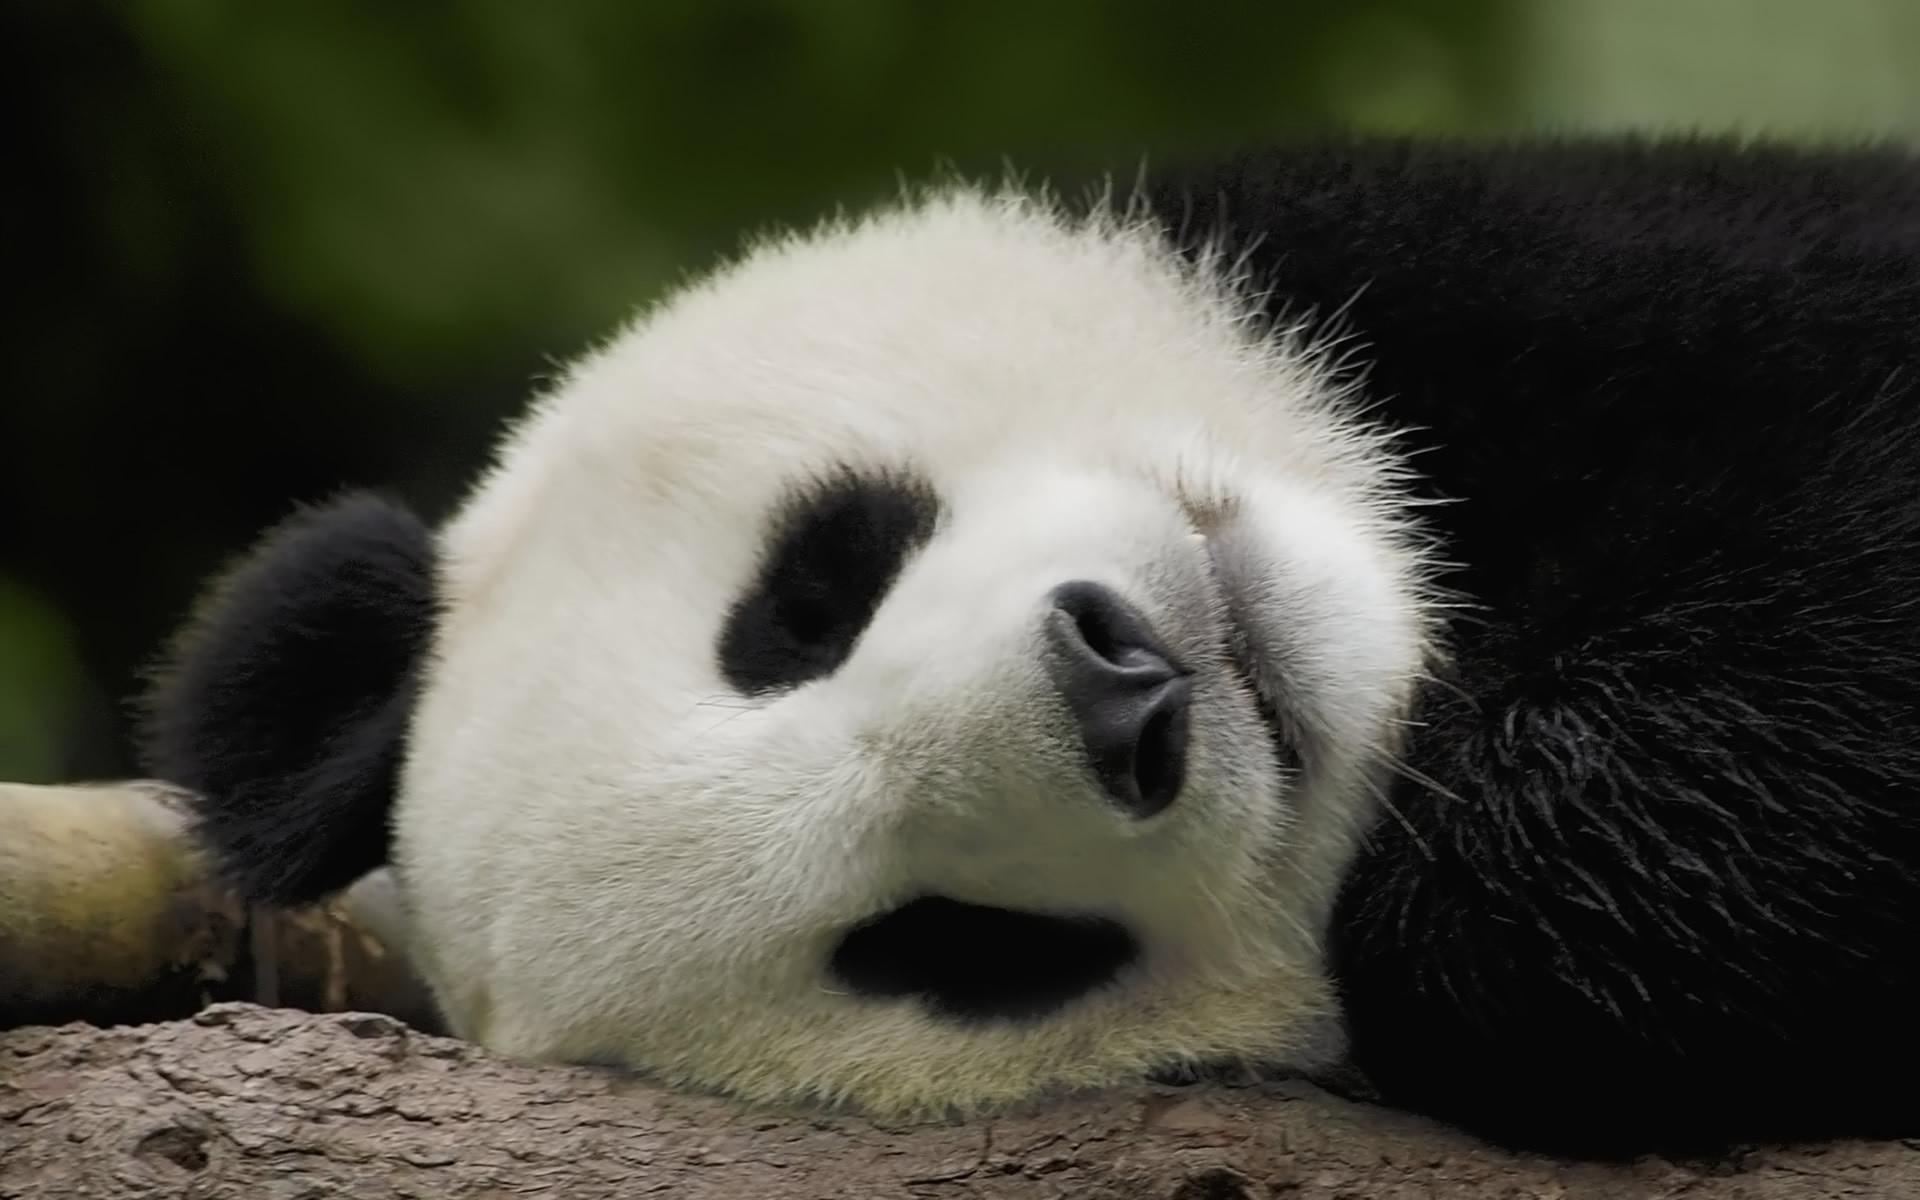 Pin by Kai Qin/Christian Gonzales on Pandas   Pinterest   Panda and Animal